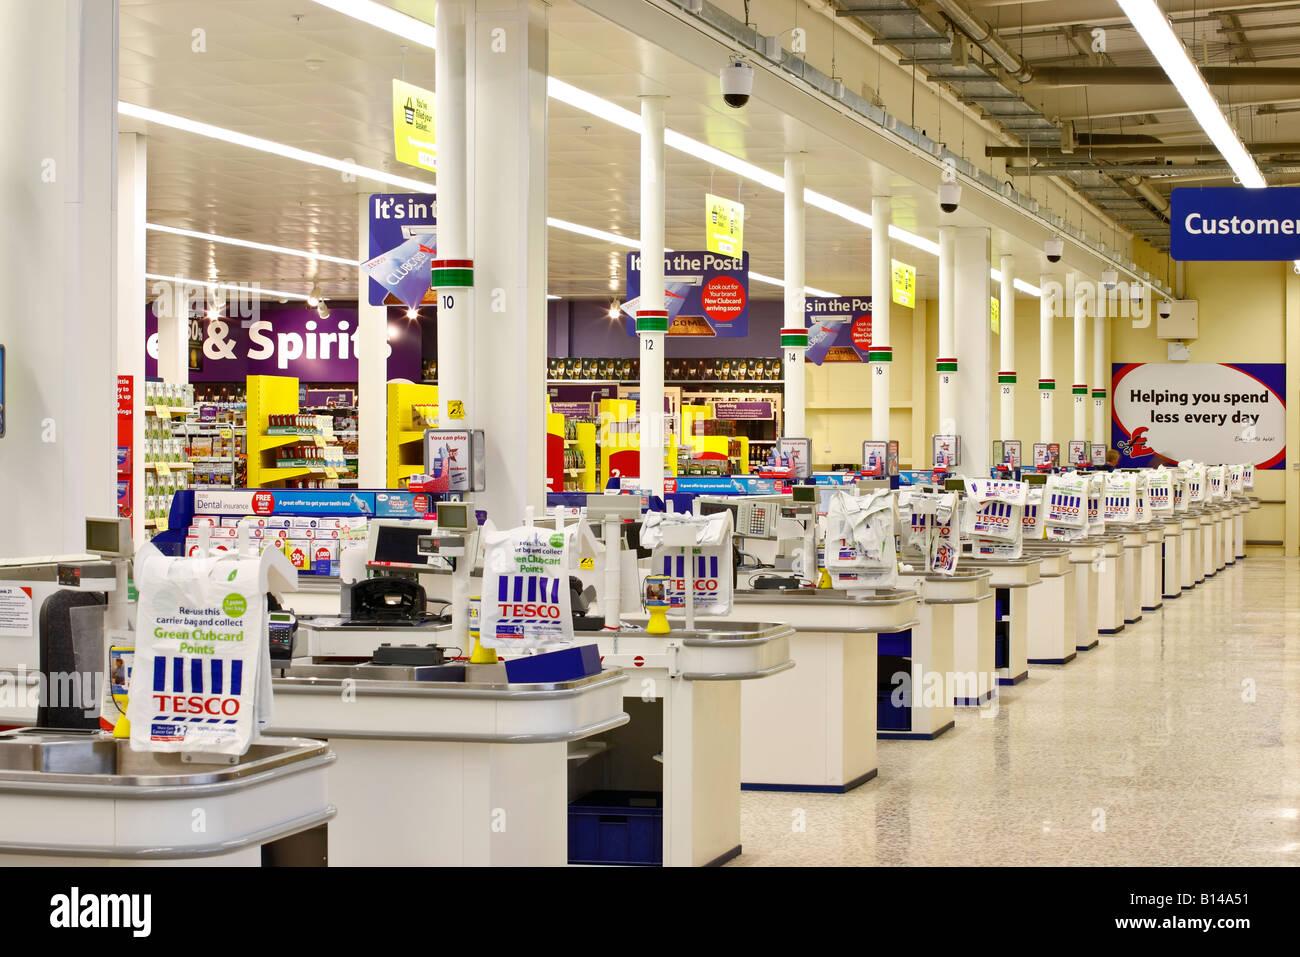 Supermarket Checkout Counters Stock Photo 17920813 Alamy